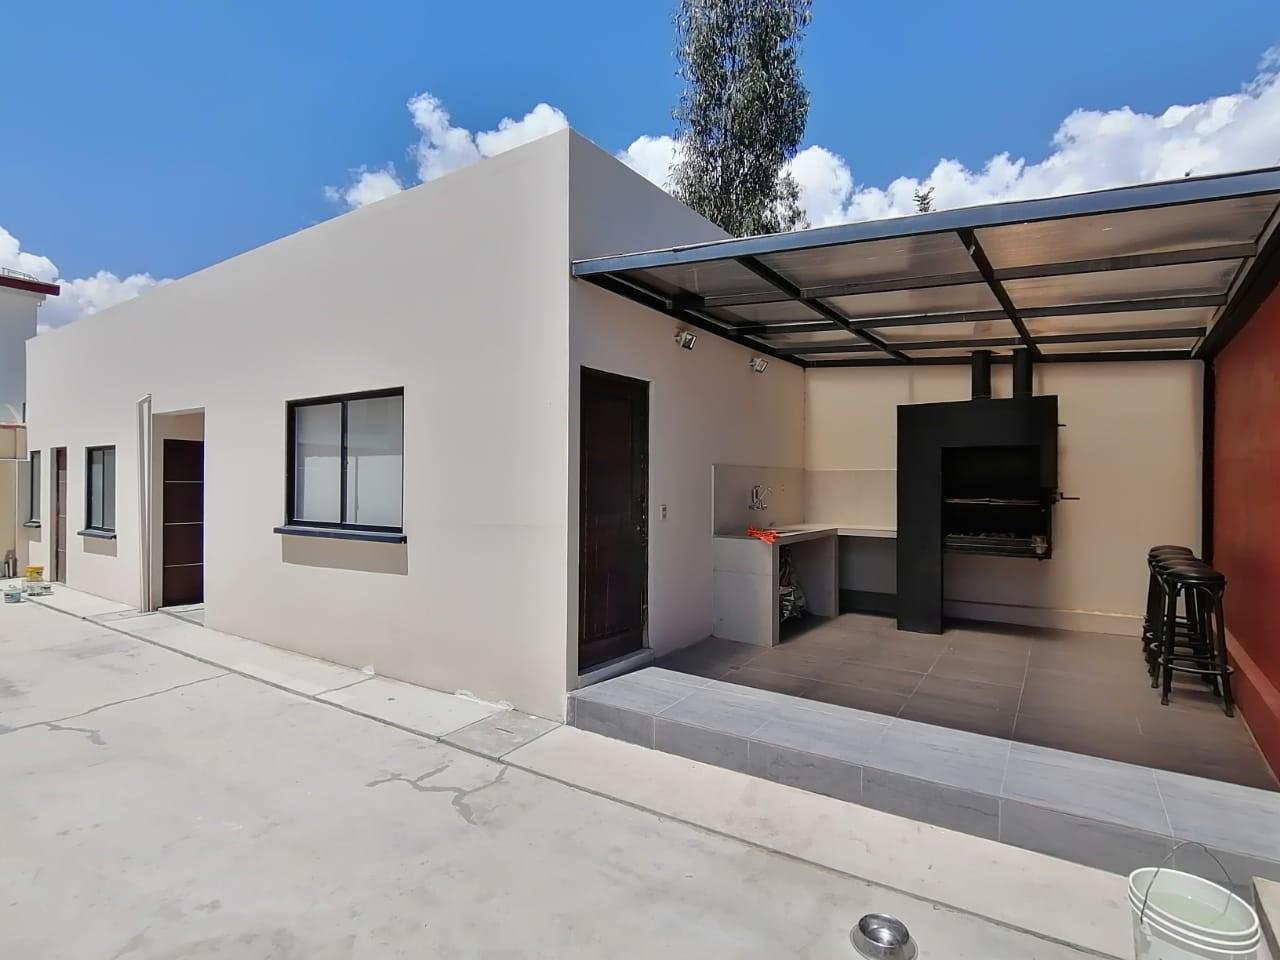 Casa en Venta $us.250.000.- LINDA CASA EN VENTA JUPAPINA 653 mtrs DE TERRENO LPZ Foto 16